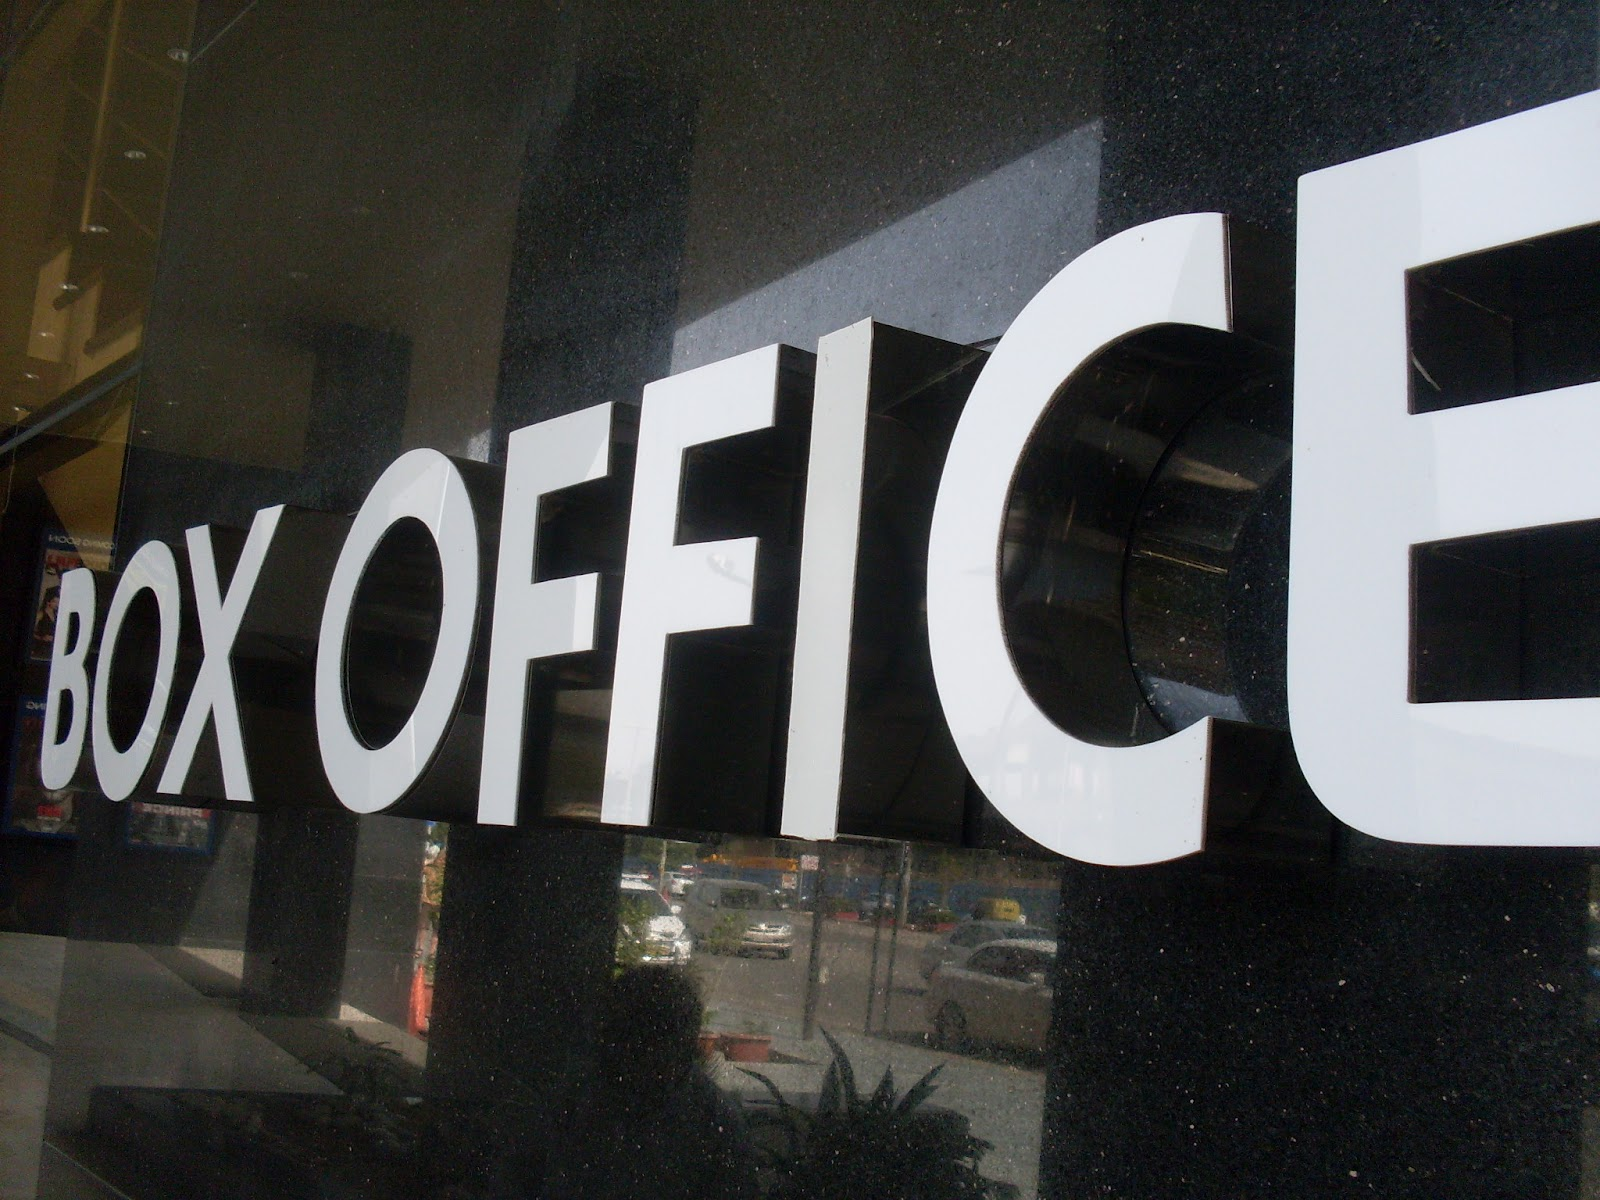 Blvdave weekend box office results april 27 2012 april - Movie box office results this weekend ...